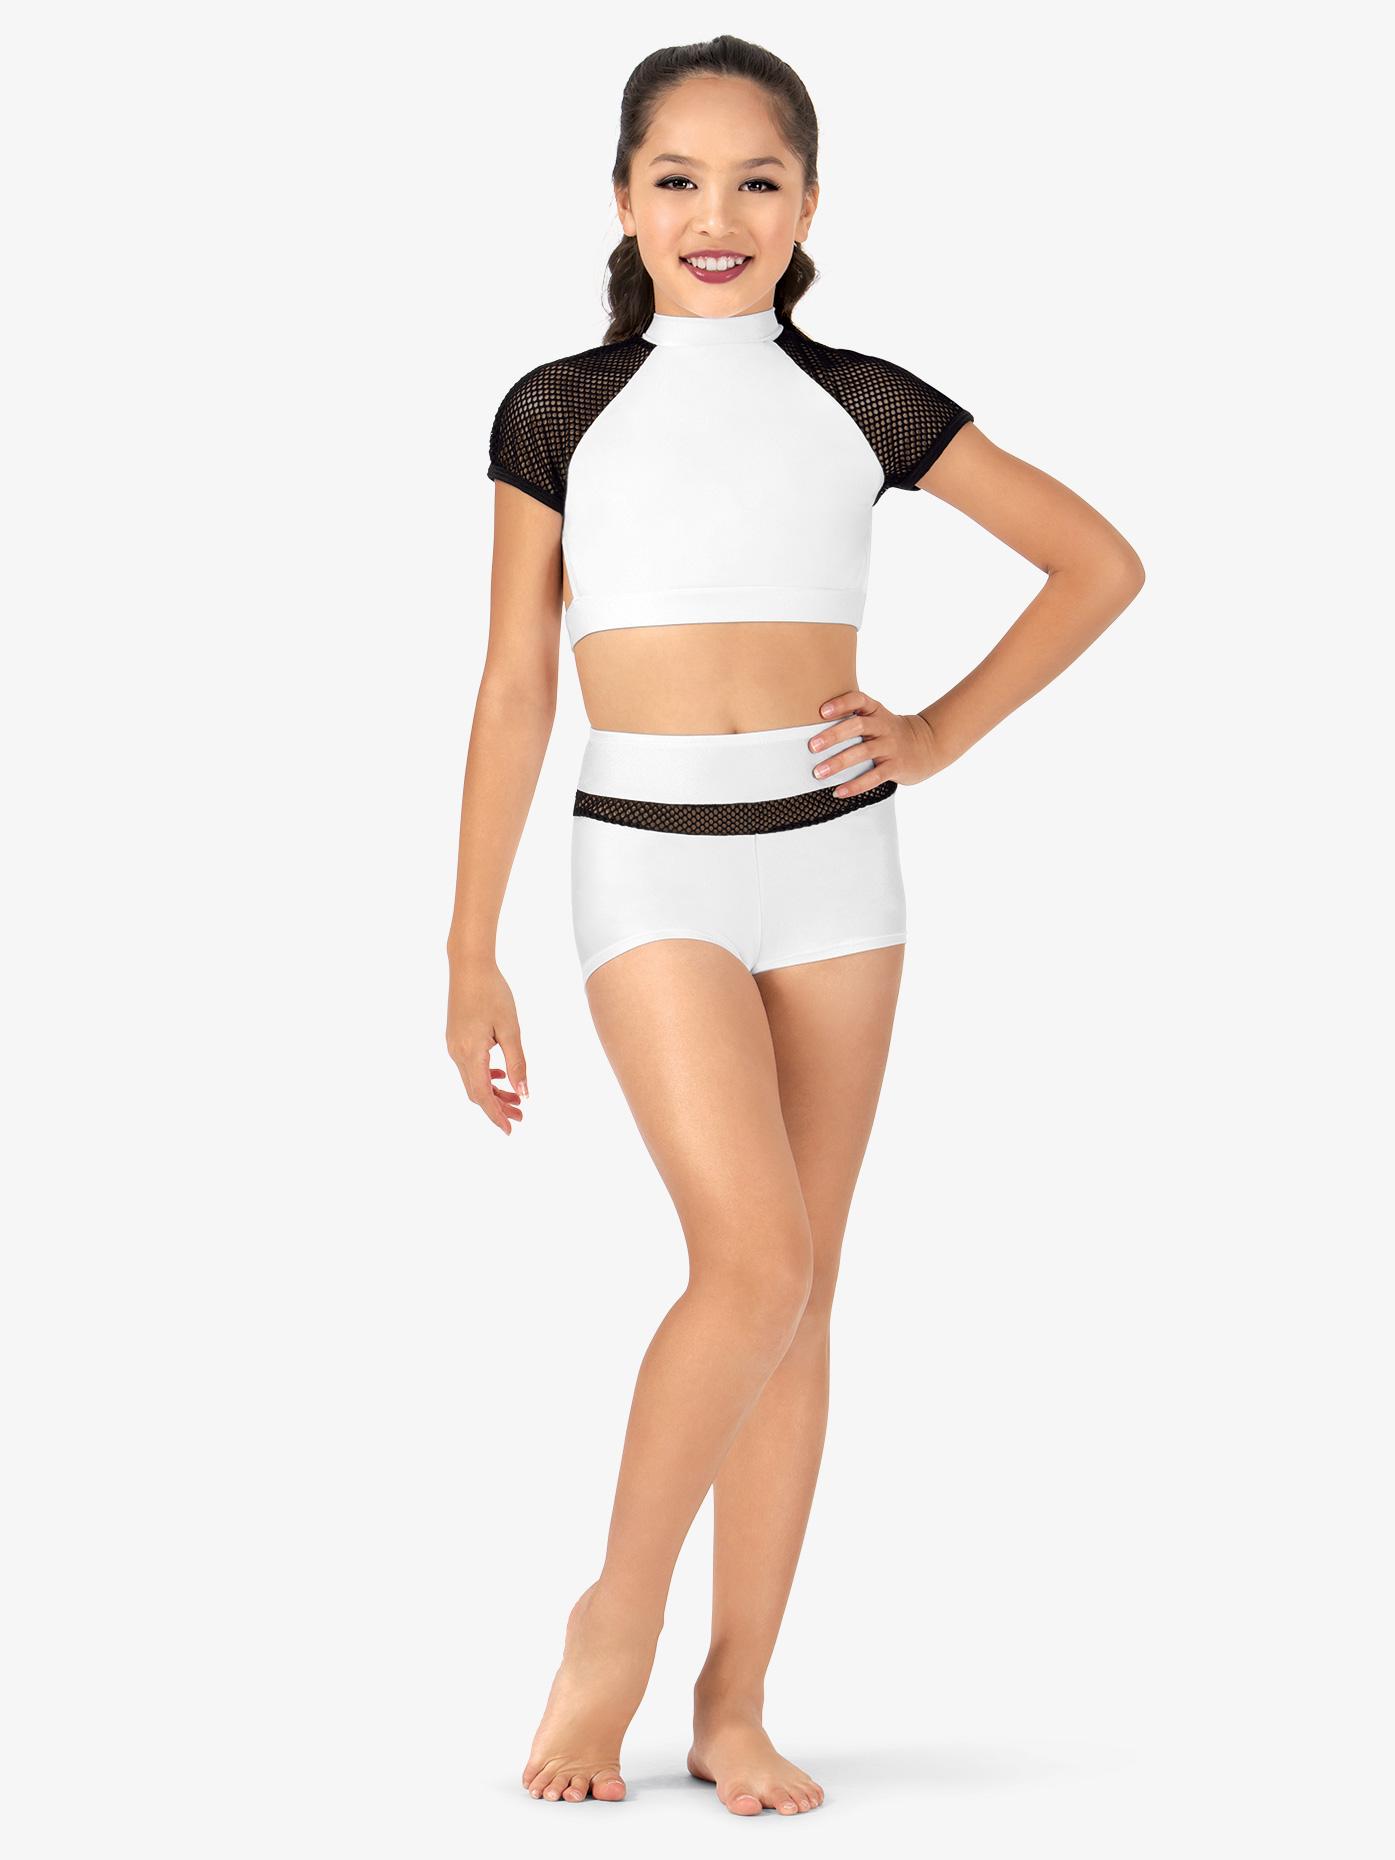 Double Platinum Girls Mesh Inset Dance Shorts N7230C